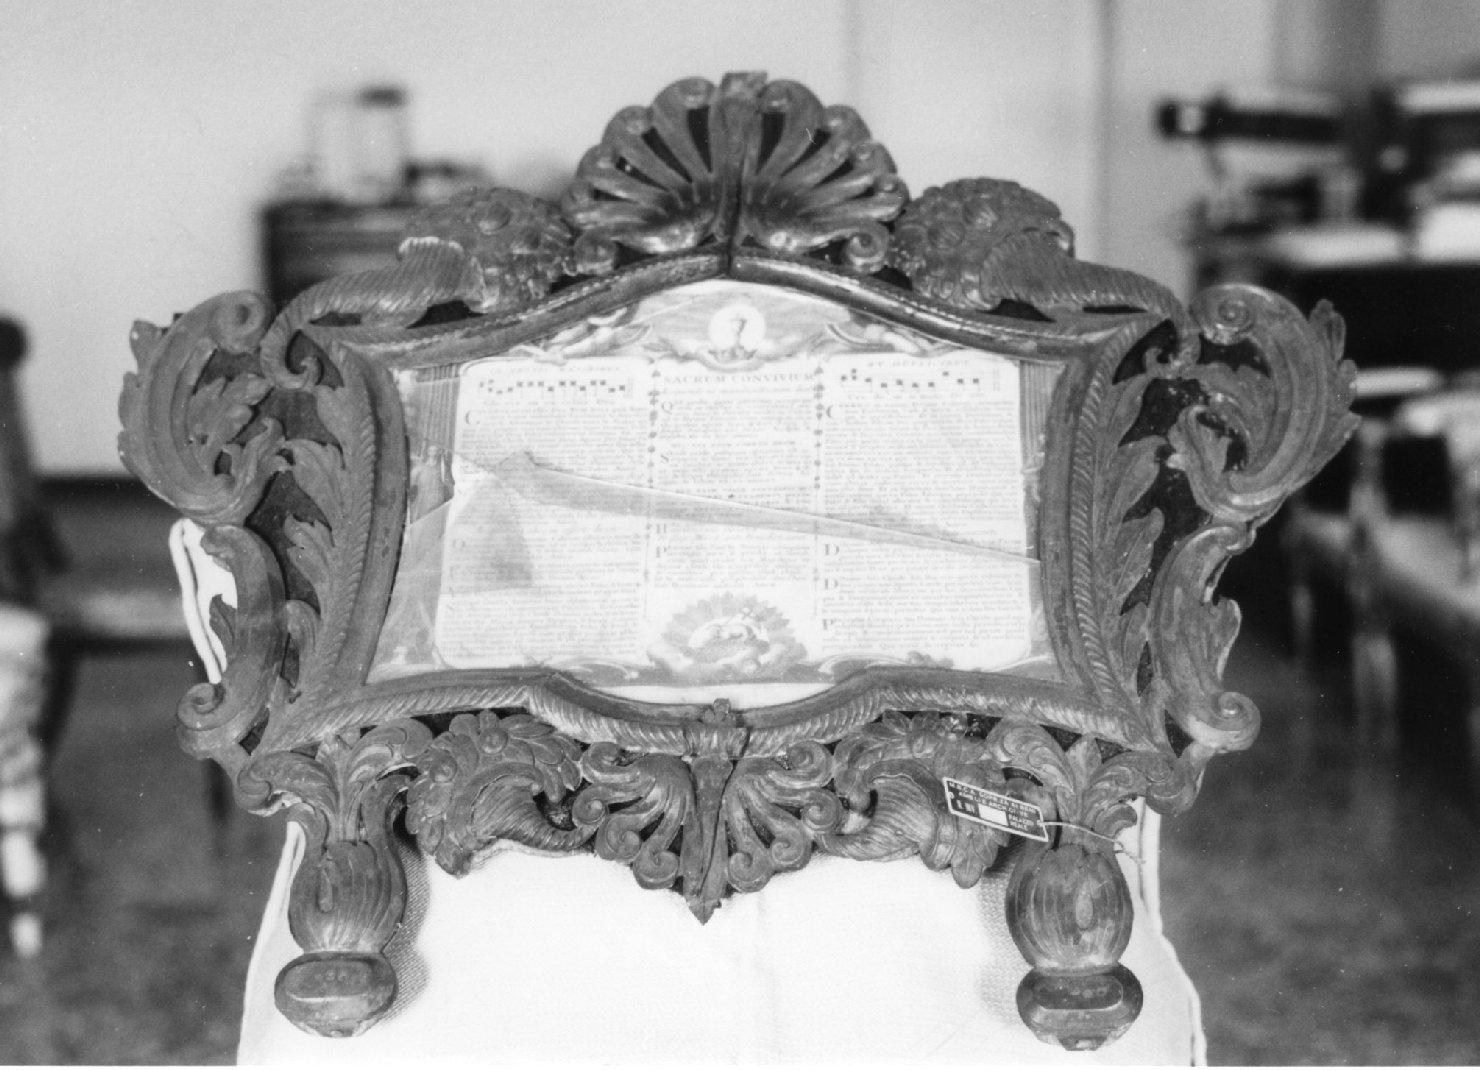 cartagloria, elemento d'insieme - manifattura italiana (metà sec. XIX)